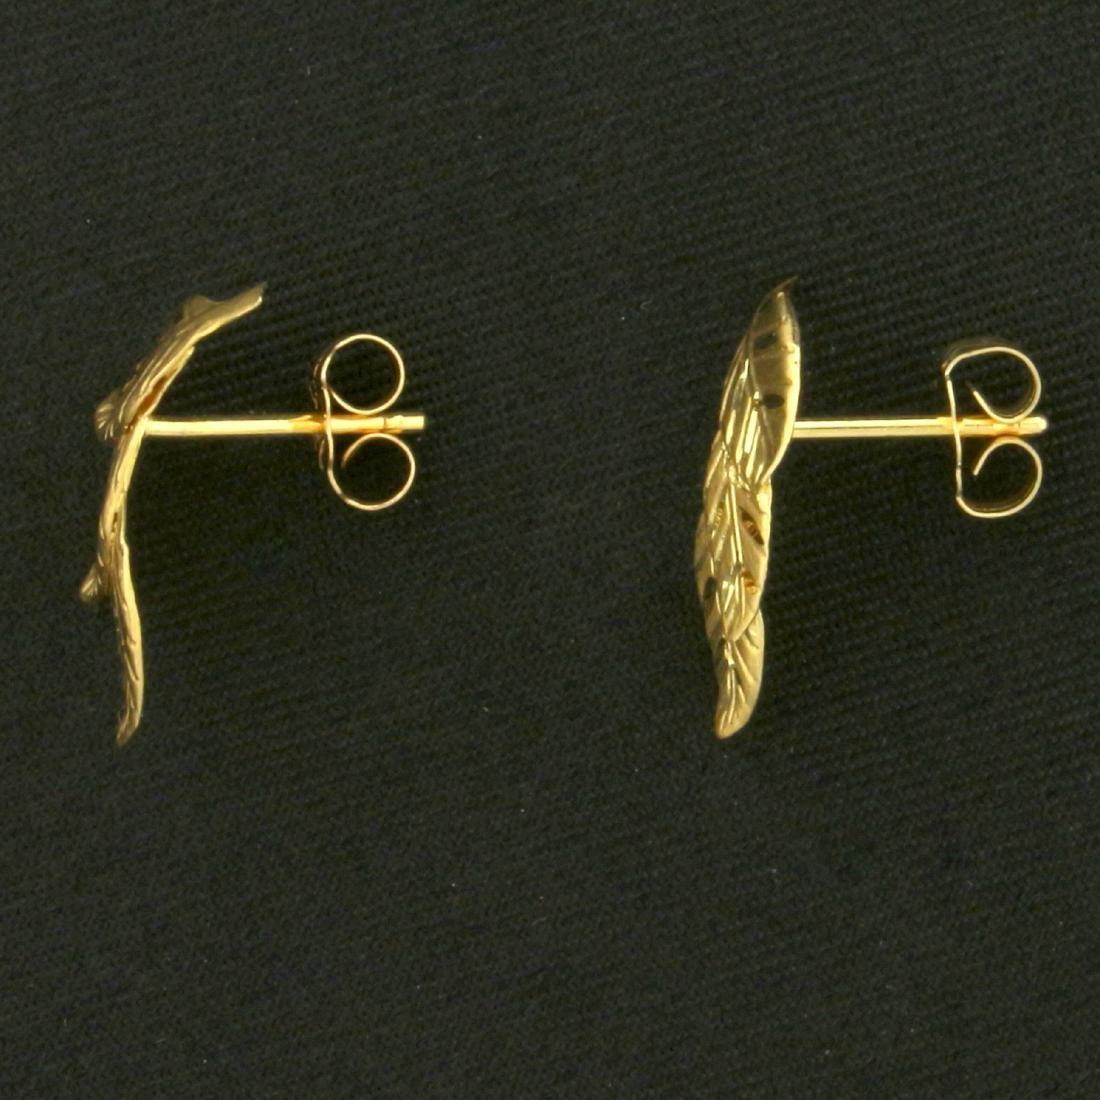 Diamond Cut Leaf Nature Earrings in 14K Yellow Gold - 2